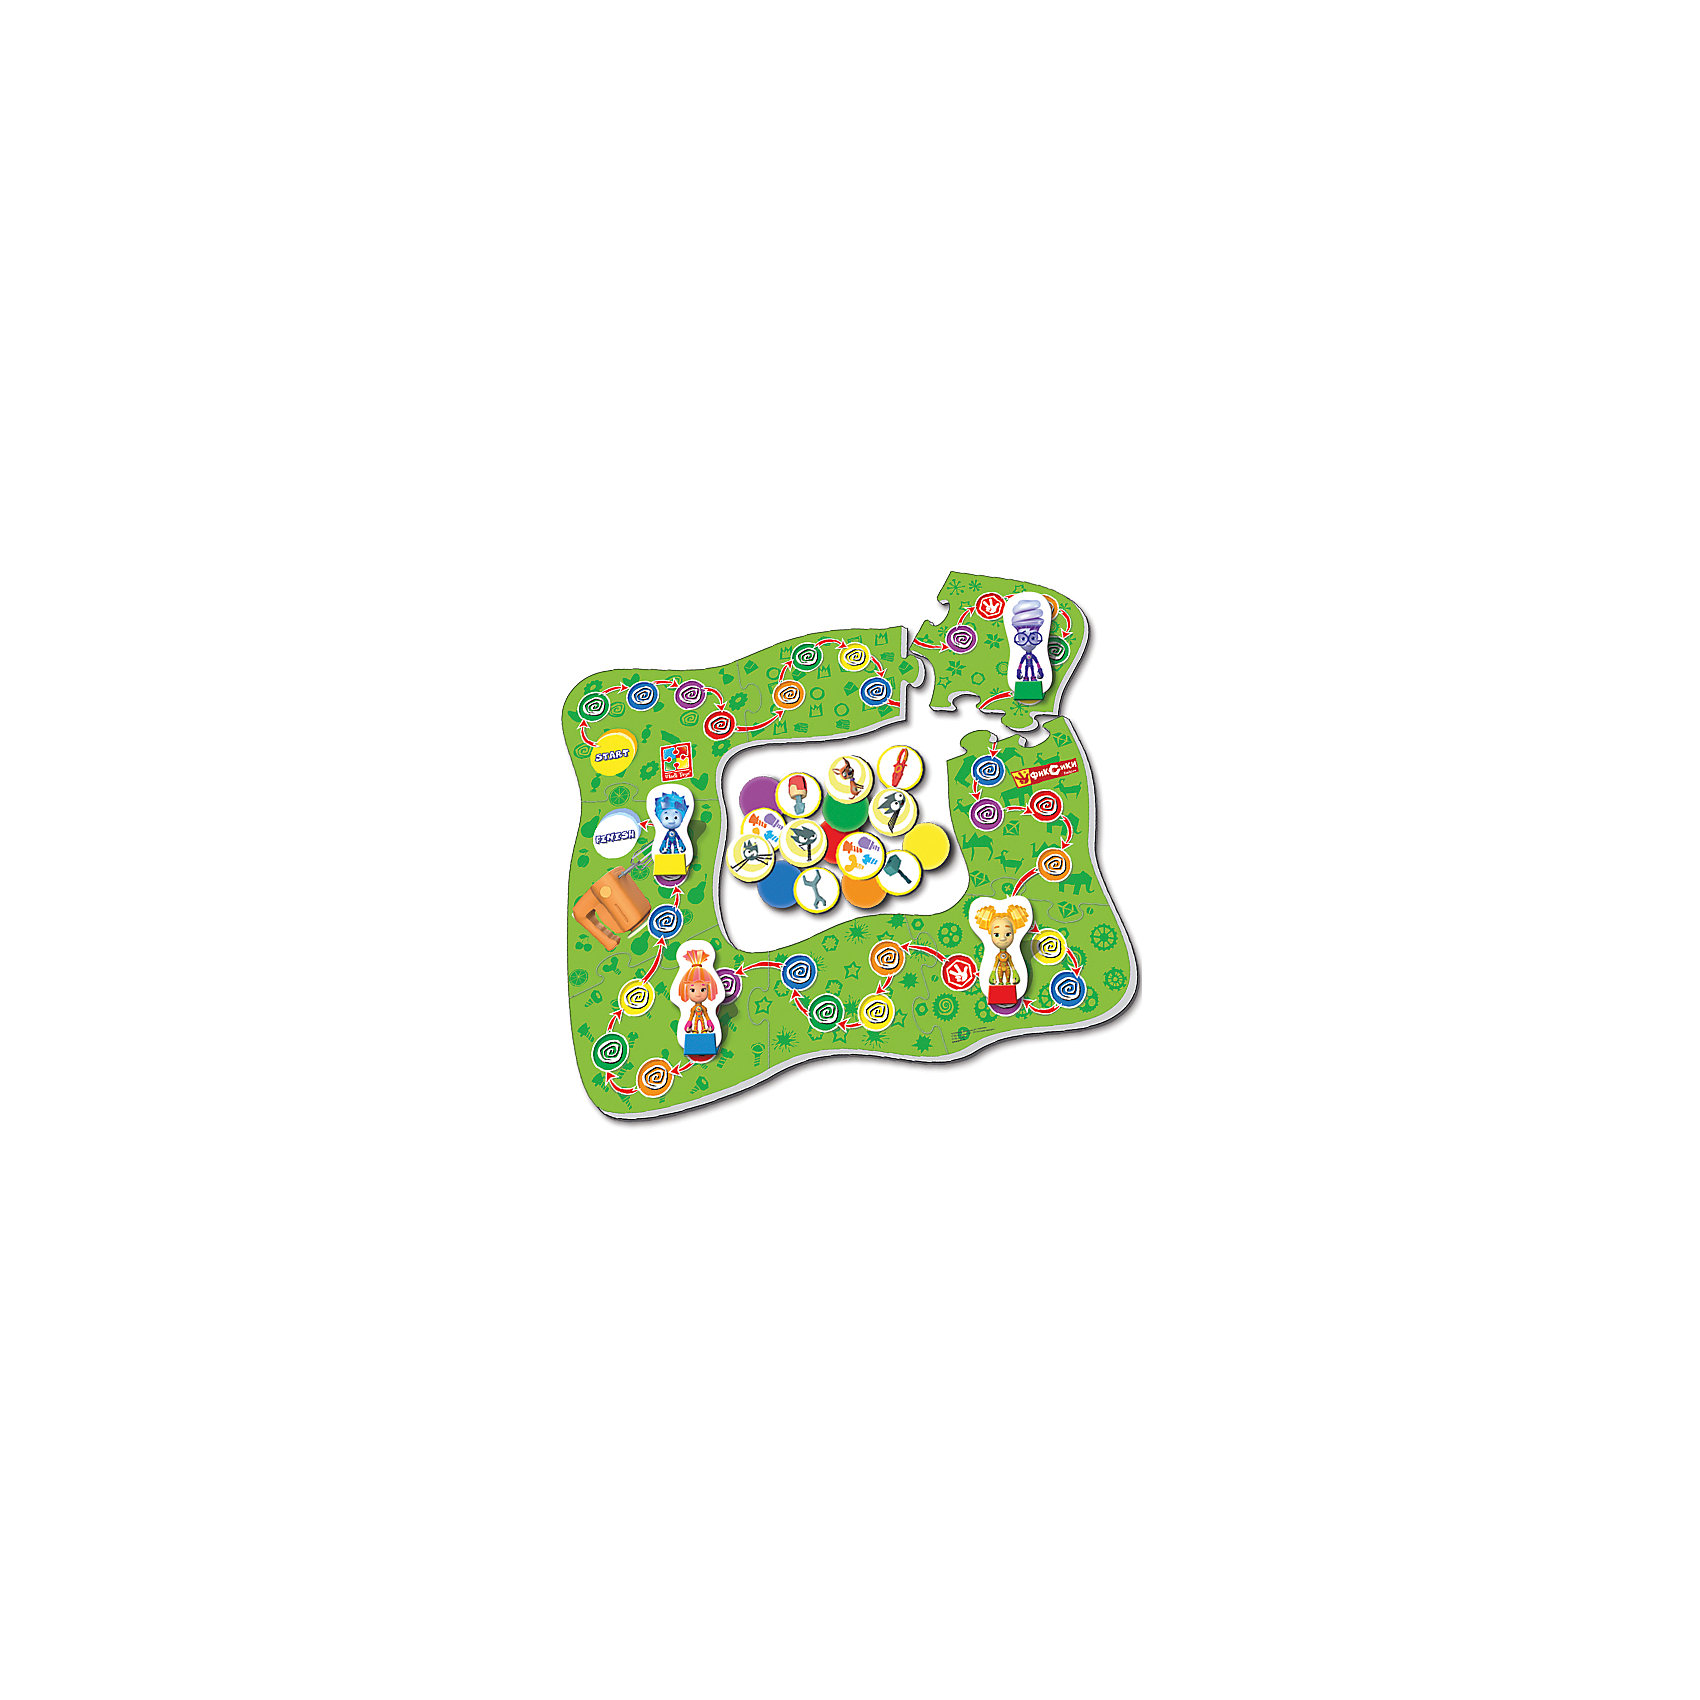 Vladi Toys Настольная игра-ходилка Миксер, Фиксики, Vladi Toys настольные игры vladi toys игра на скорость сковородки